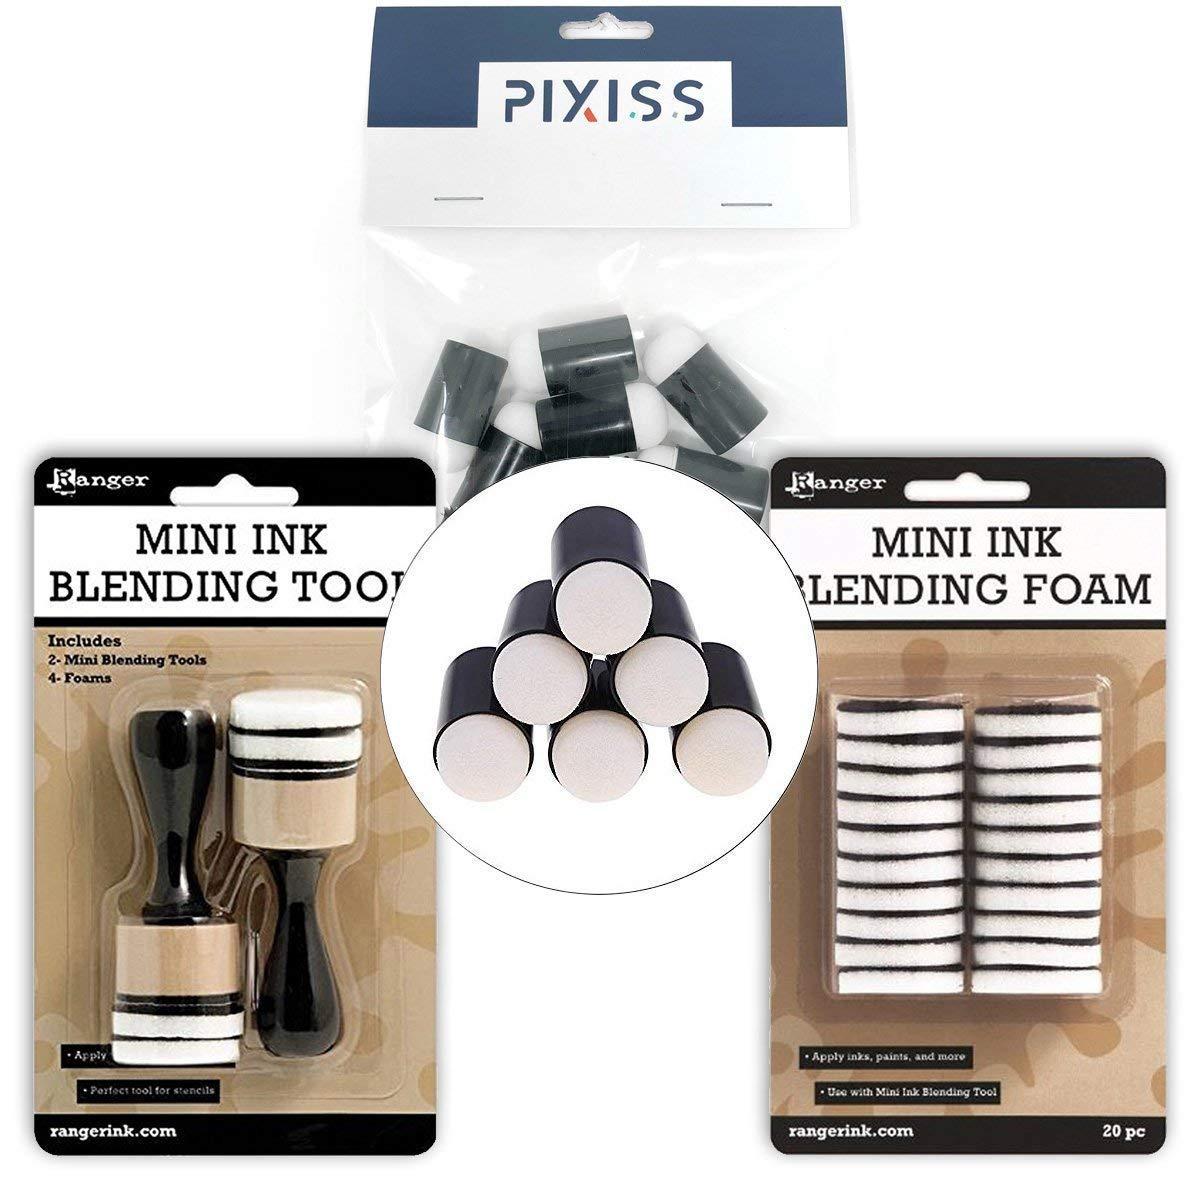 Ink Blending Bundle, 2 Ranger Mini Ink Blending Tools, 20pc Blending Foam Replacements & 6 Pixiss Finger Sponge Daubers